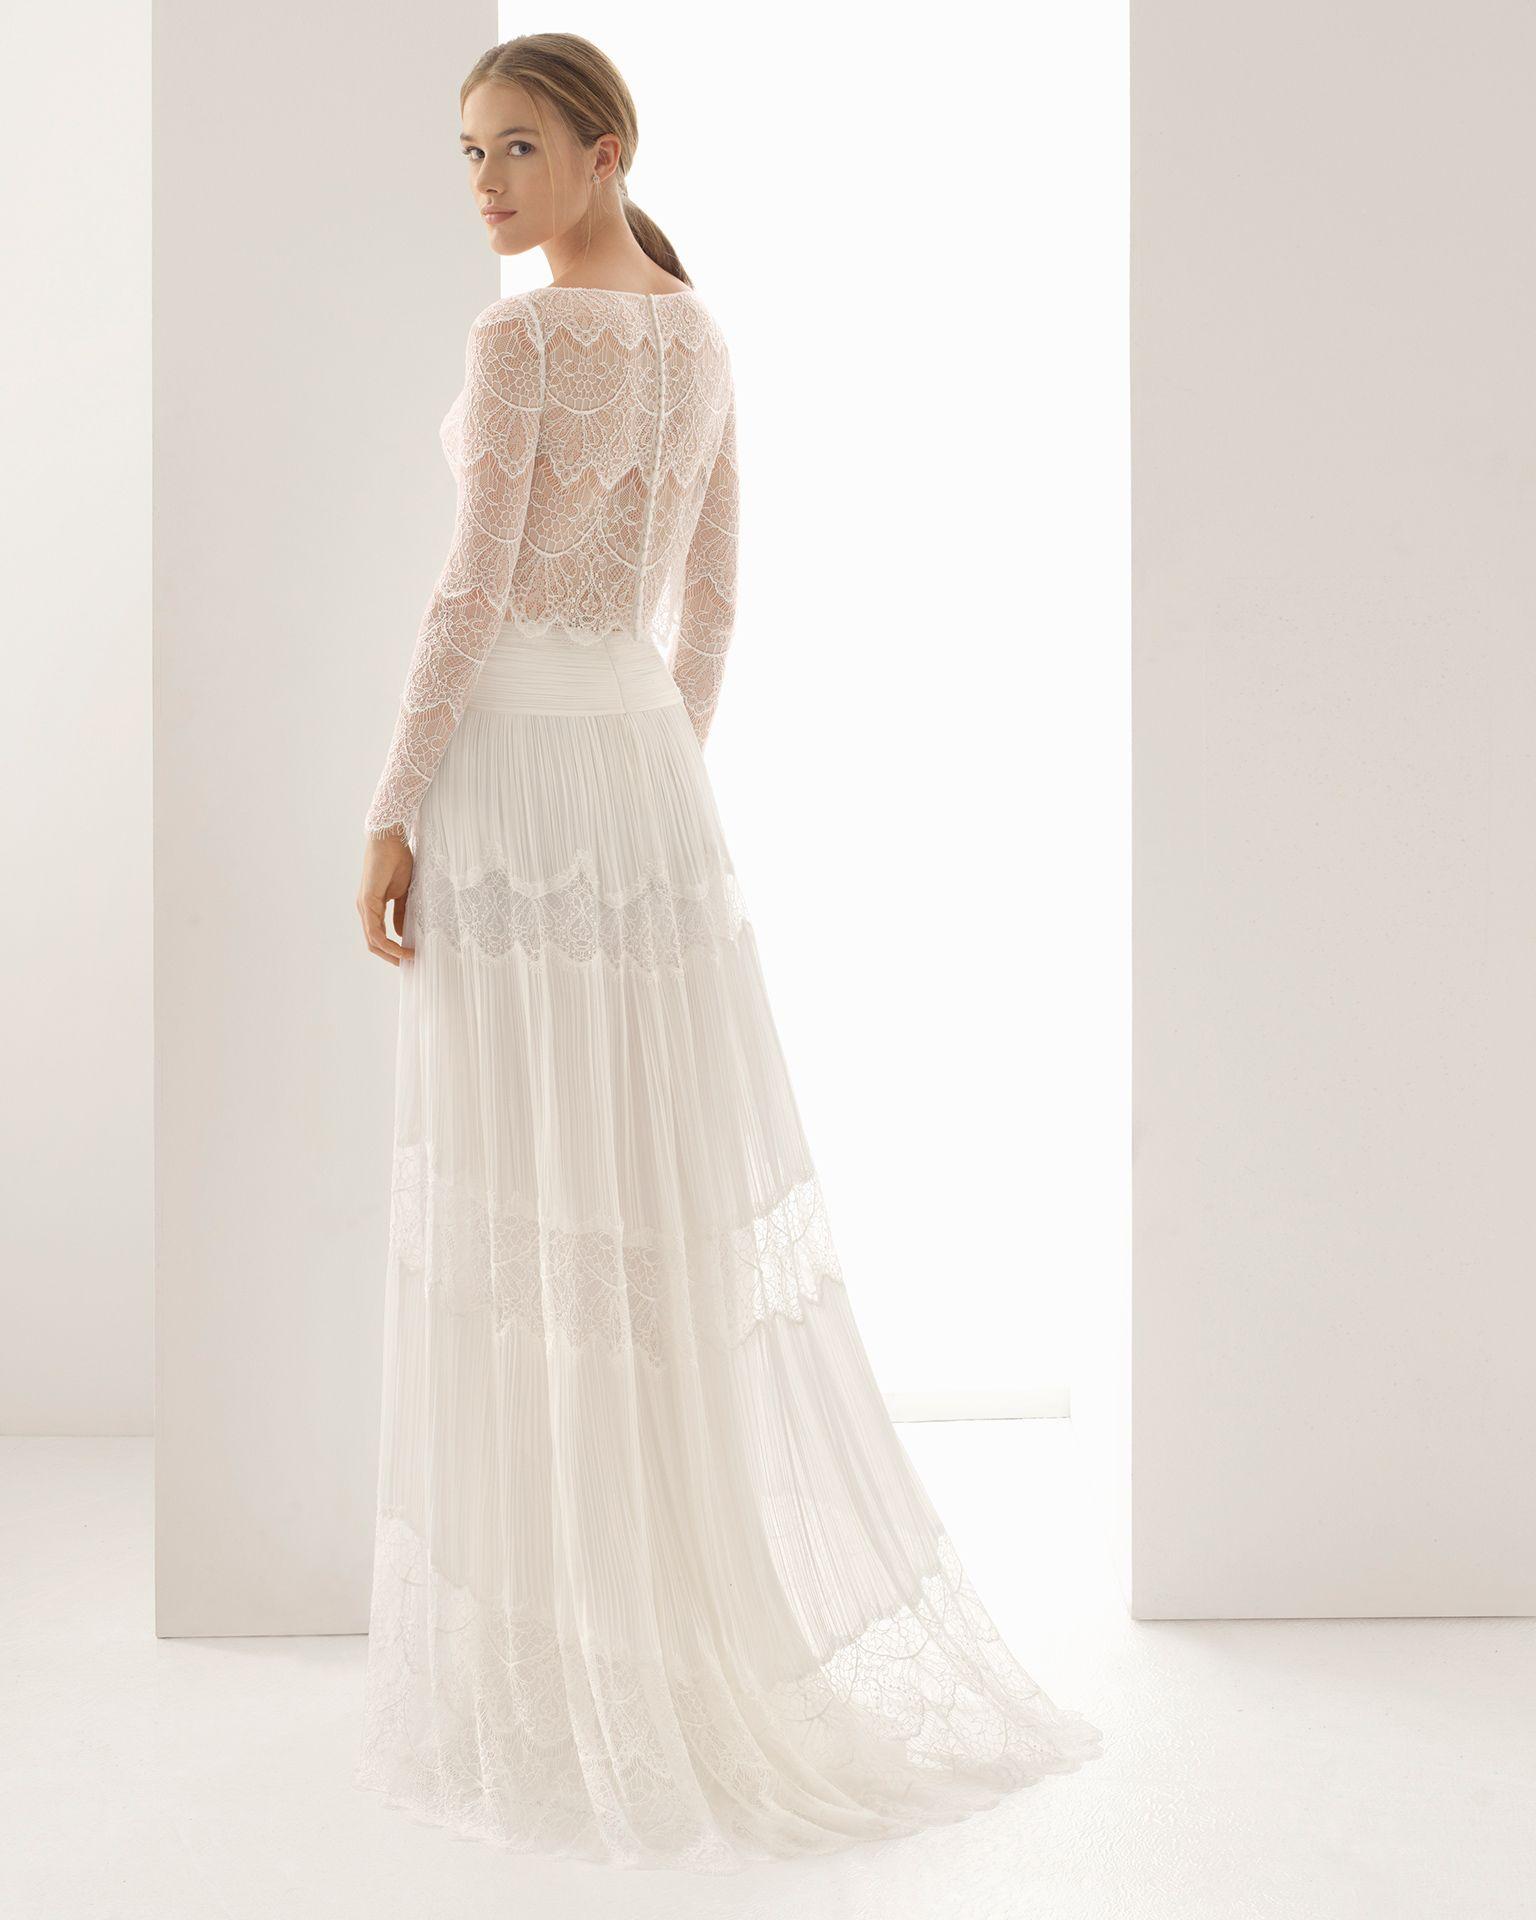 PAVEL - Hochzeit 2018. Kollektion Rosa Clará Couture | Pinterest ...